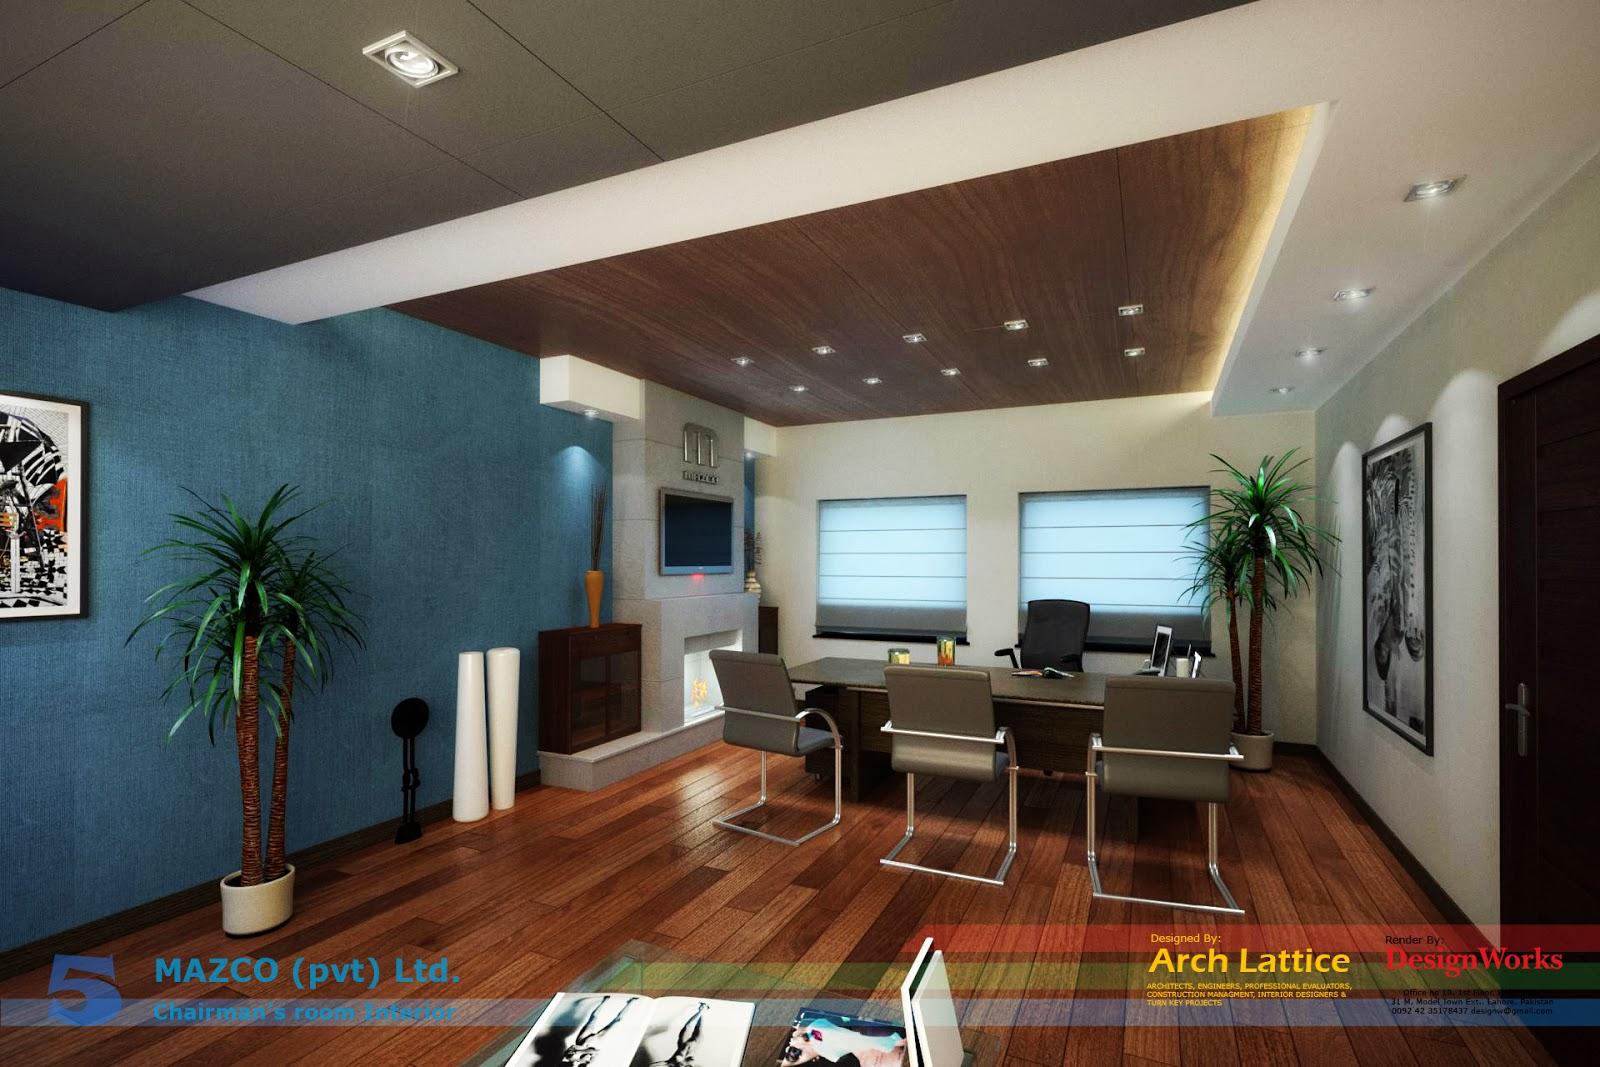 Office (Mazco Industries Pvt Ltd.).